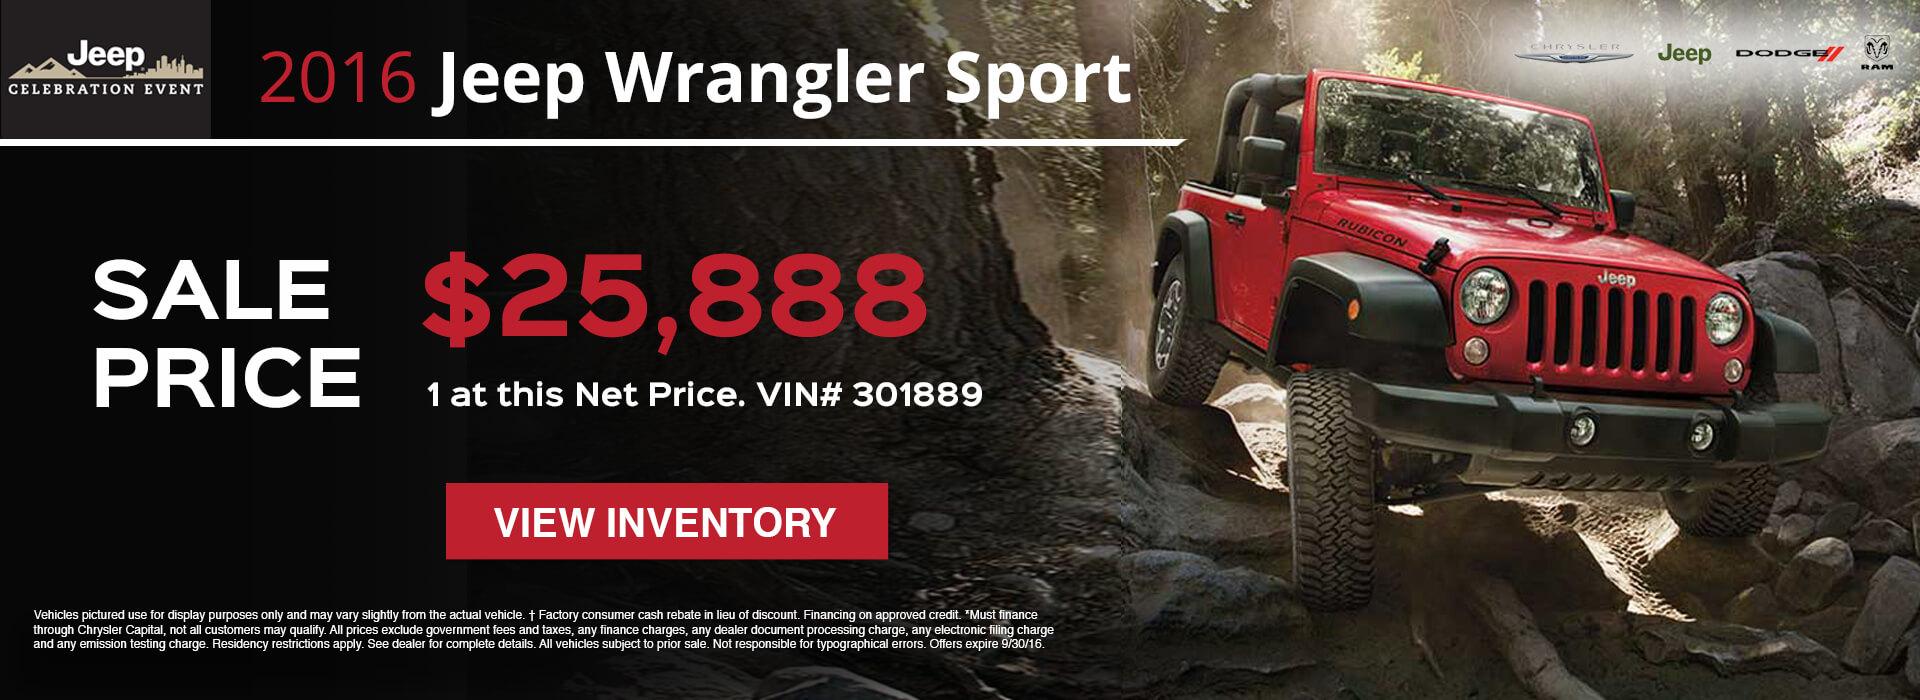 2016 Jeep Wrangler HP